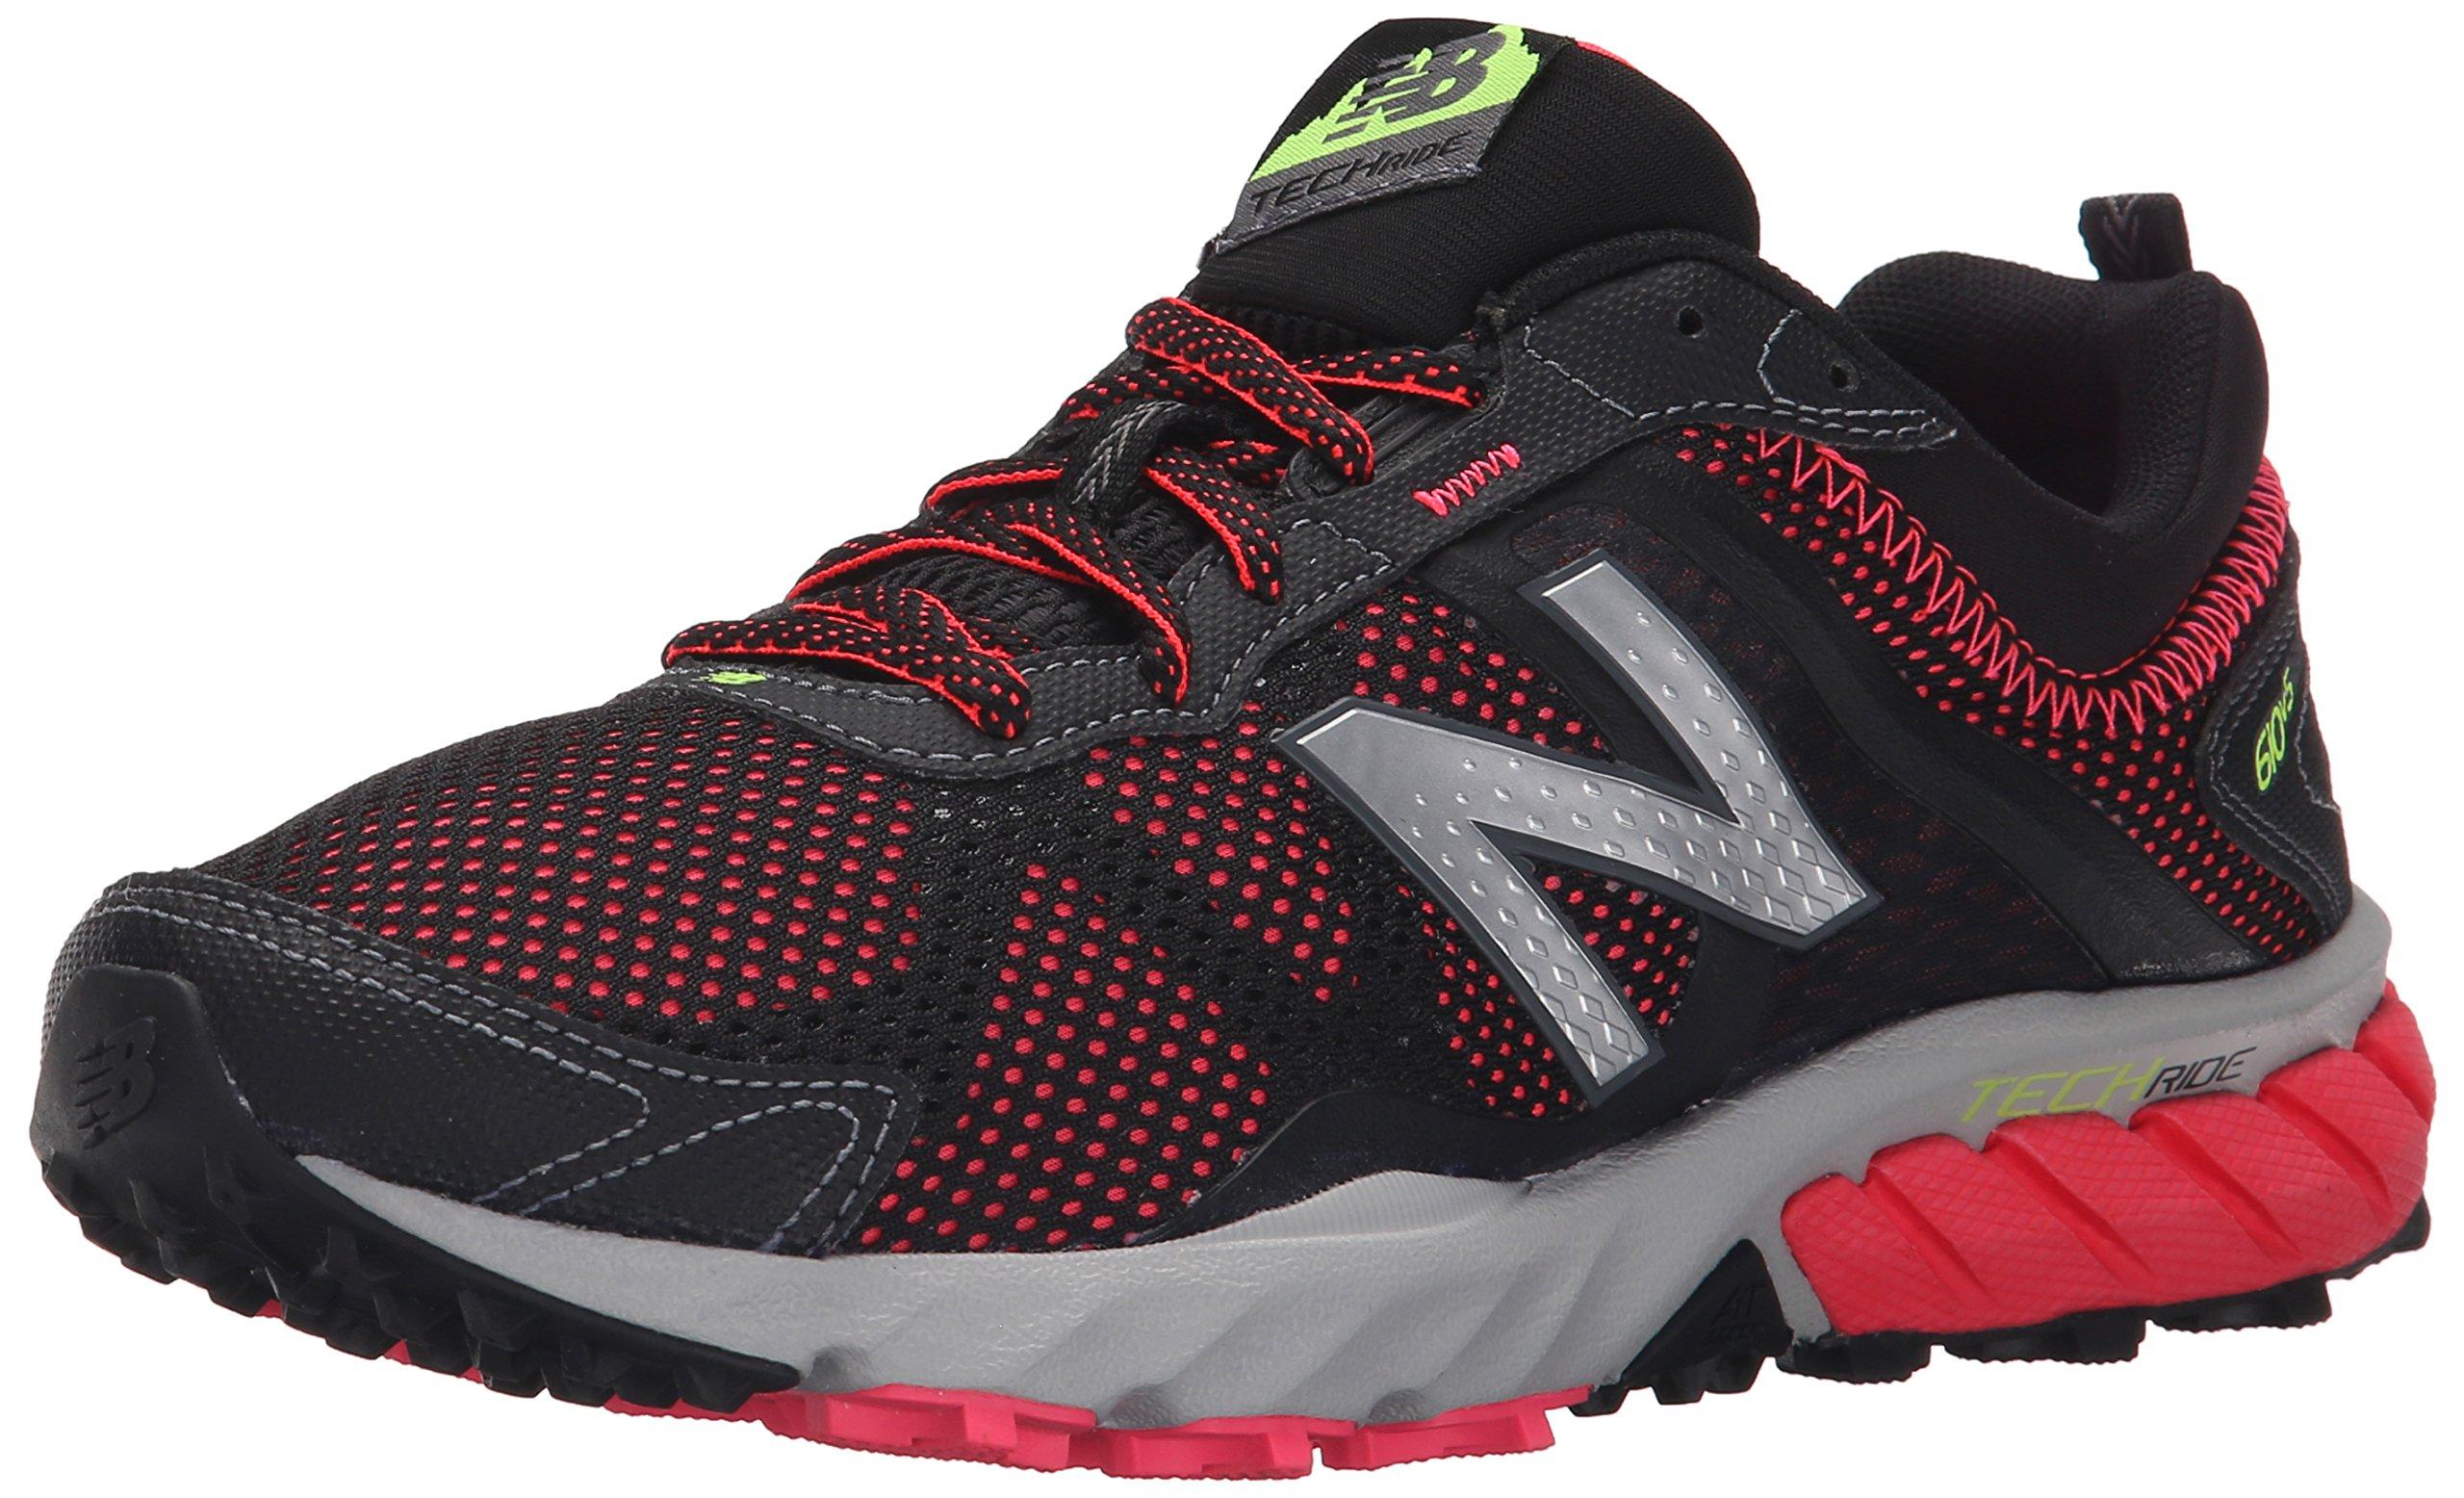 New Balance Women's WT610V5 Trail Shoe, Black/Pink, 11 B US